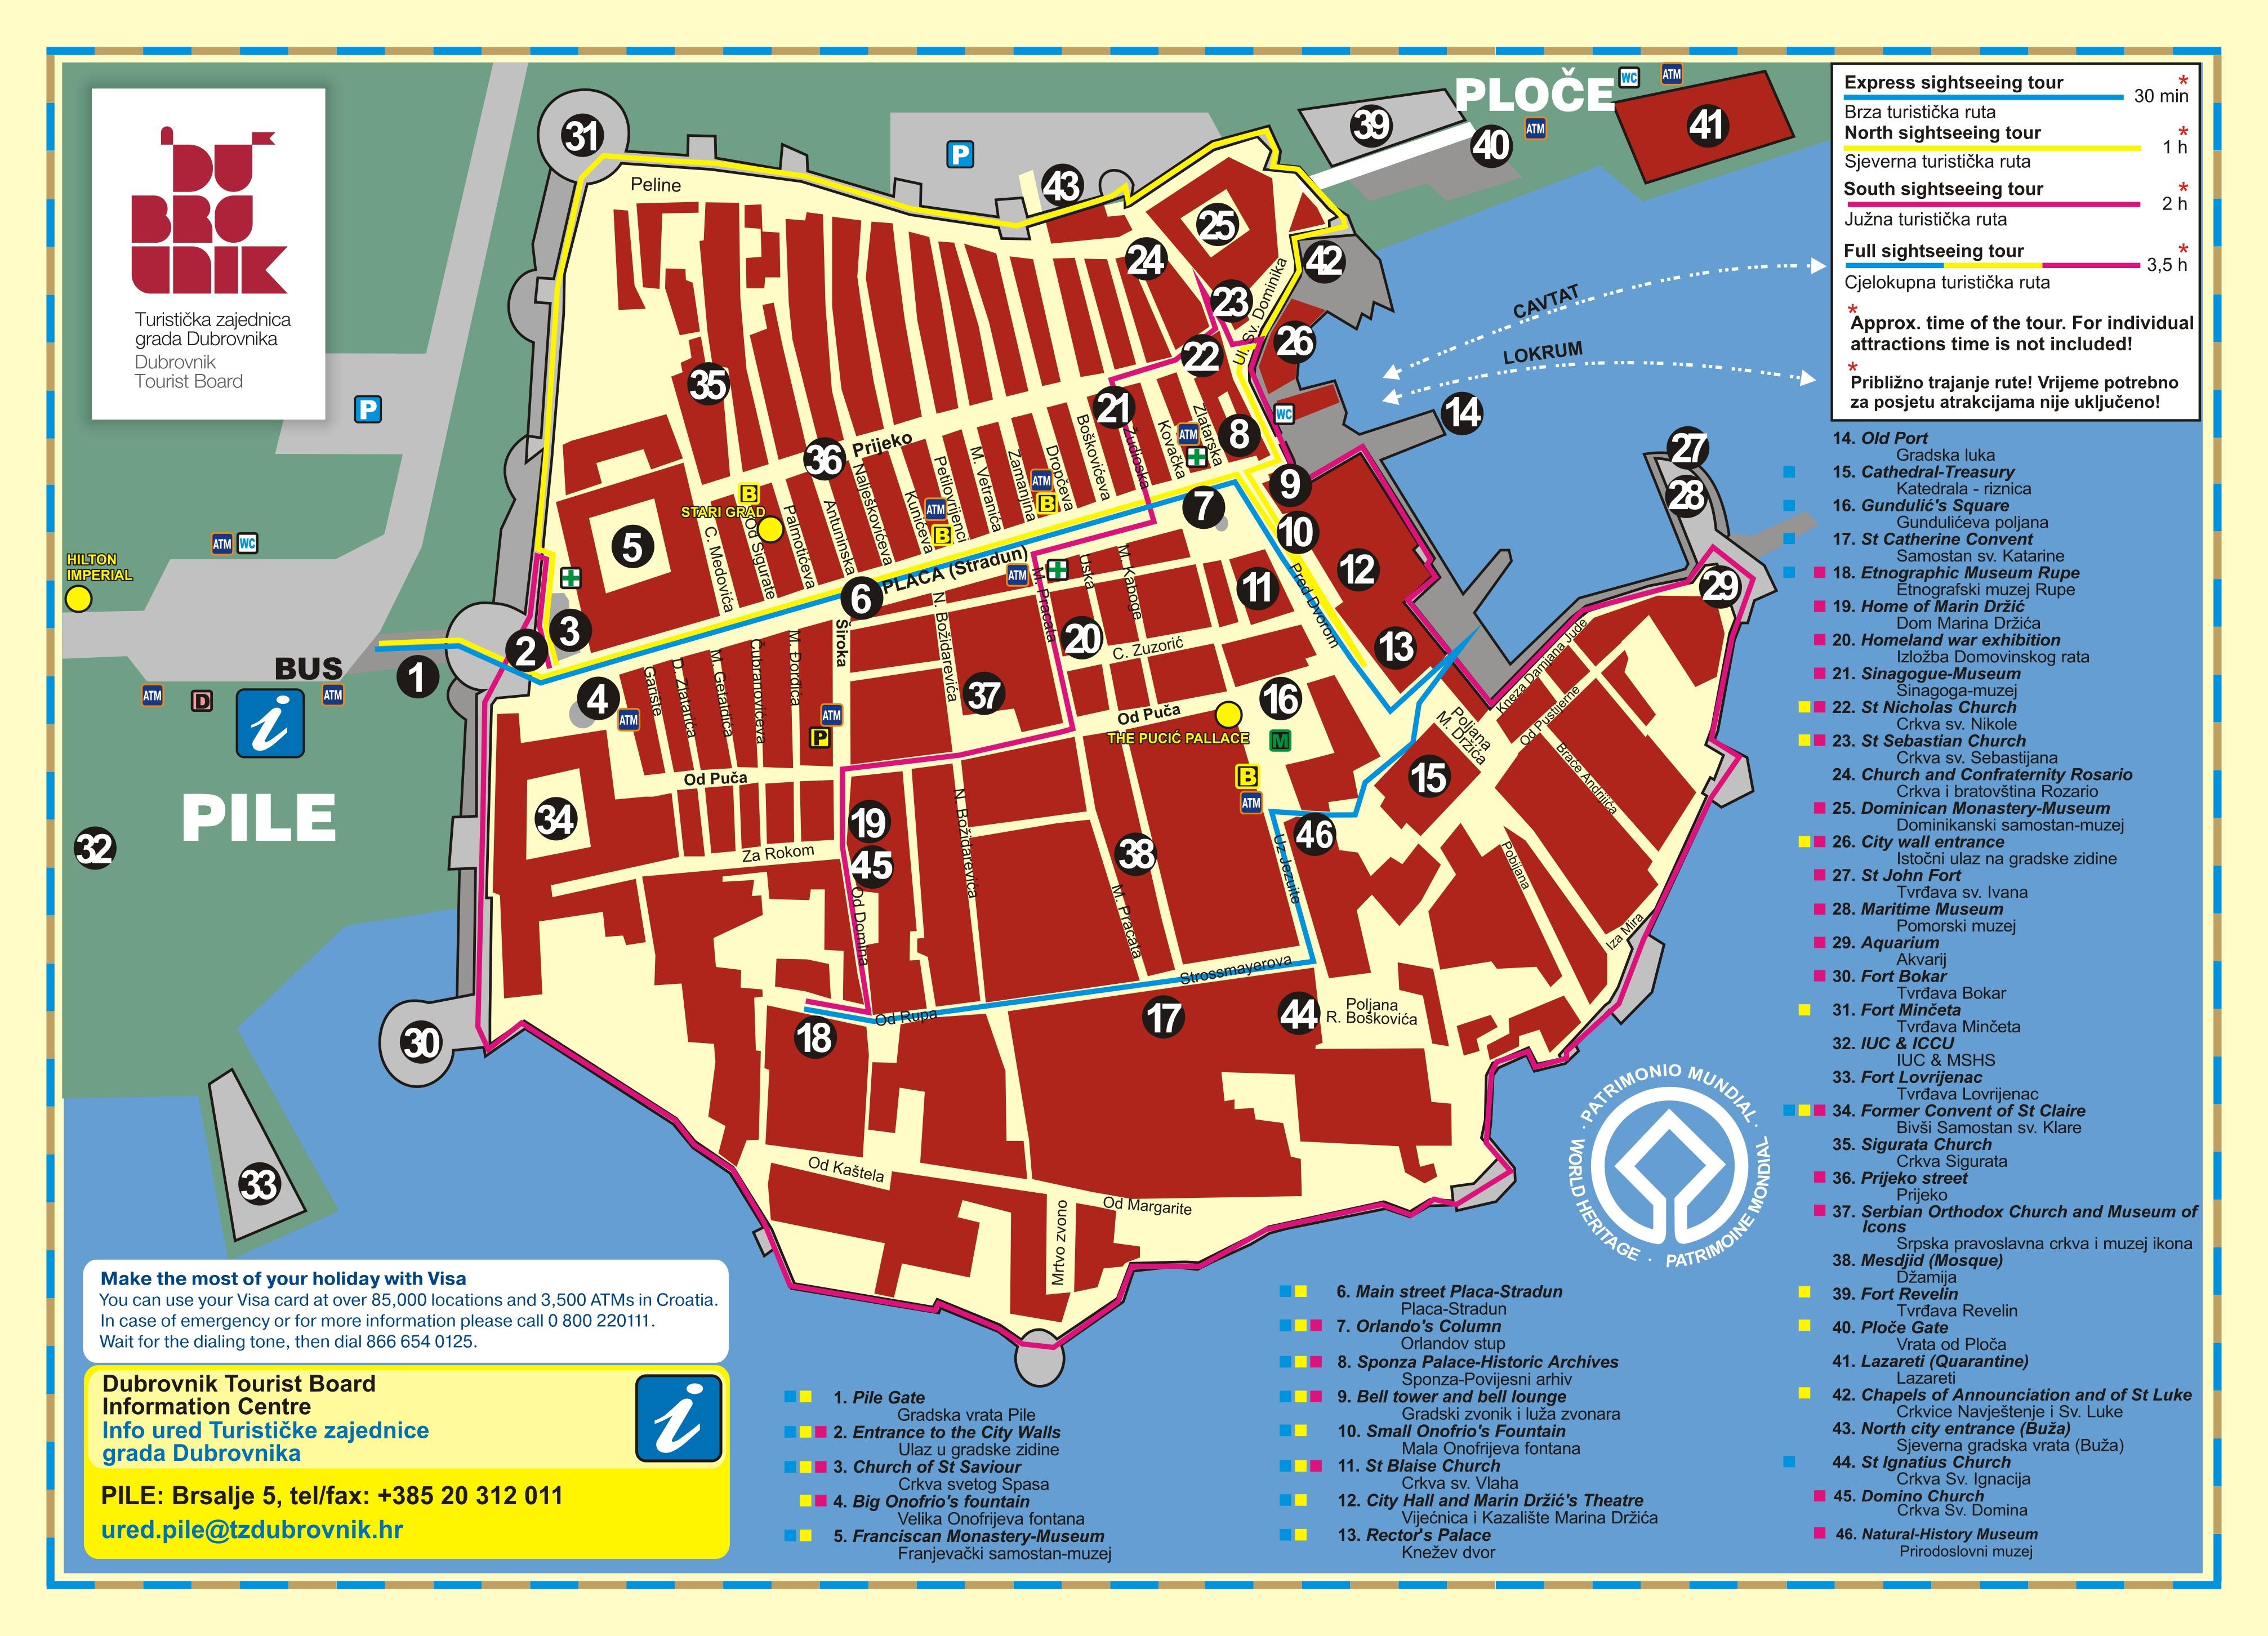 Dubrovnik Croatia Blog About Interesting Places